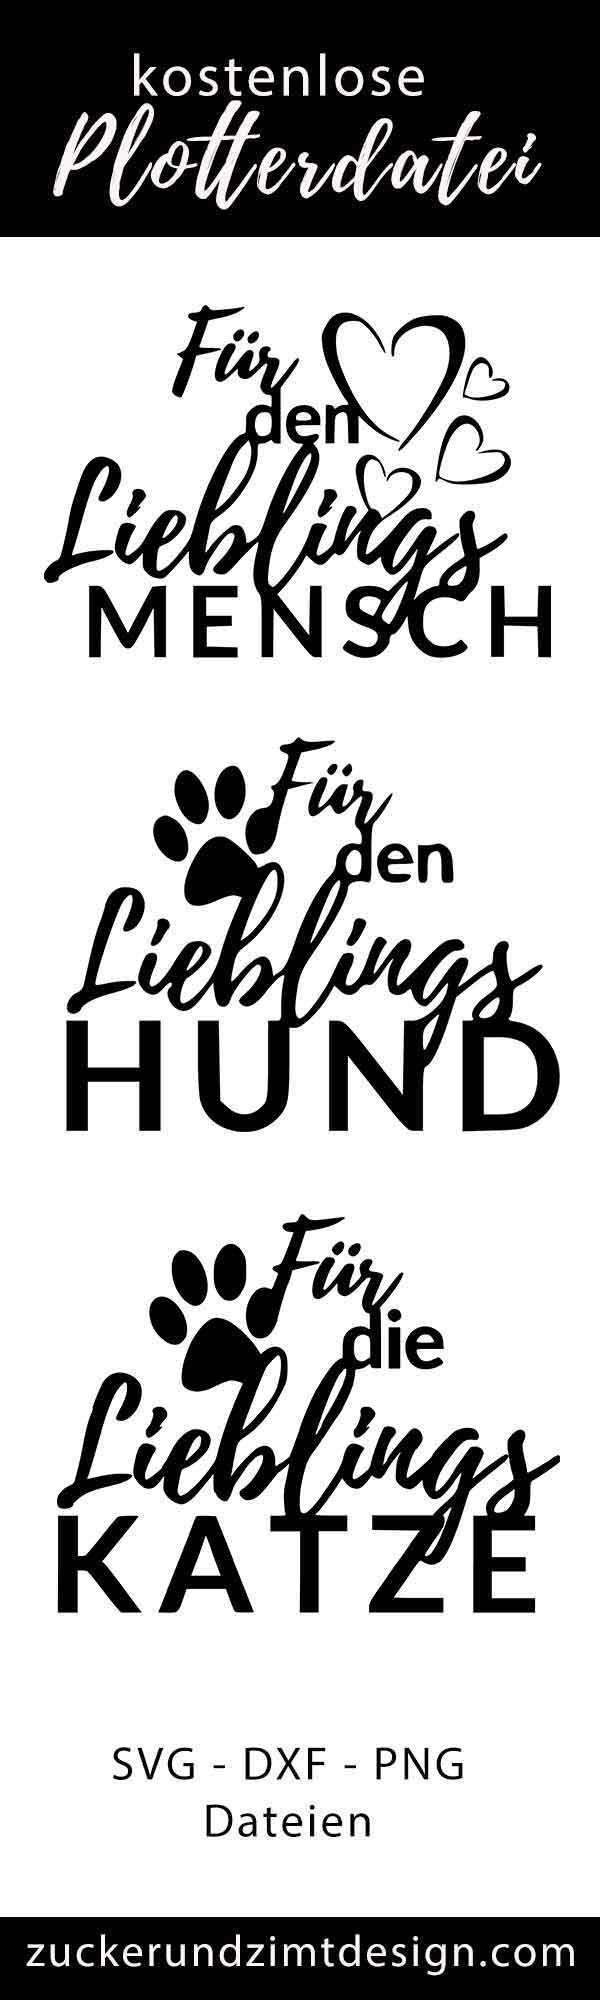 [Plotterdatei Freebie] Lieblingsmensch ‖ Lieblingshund ‖ Lieblingskatze